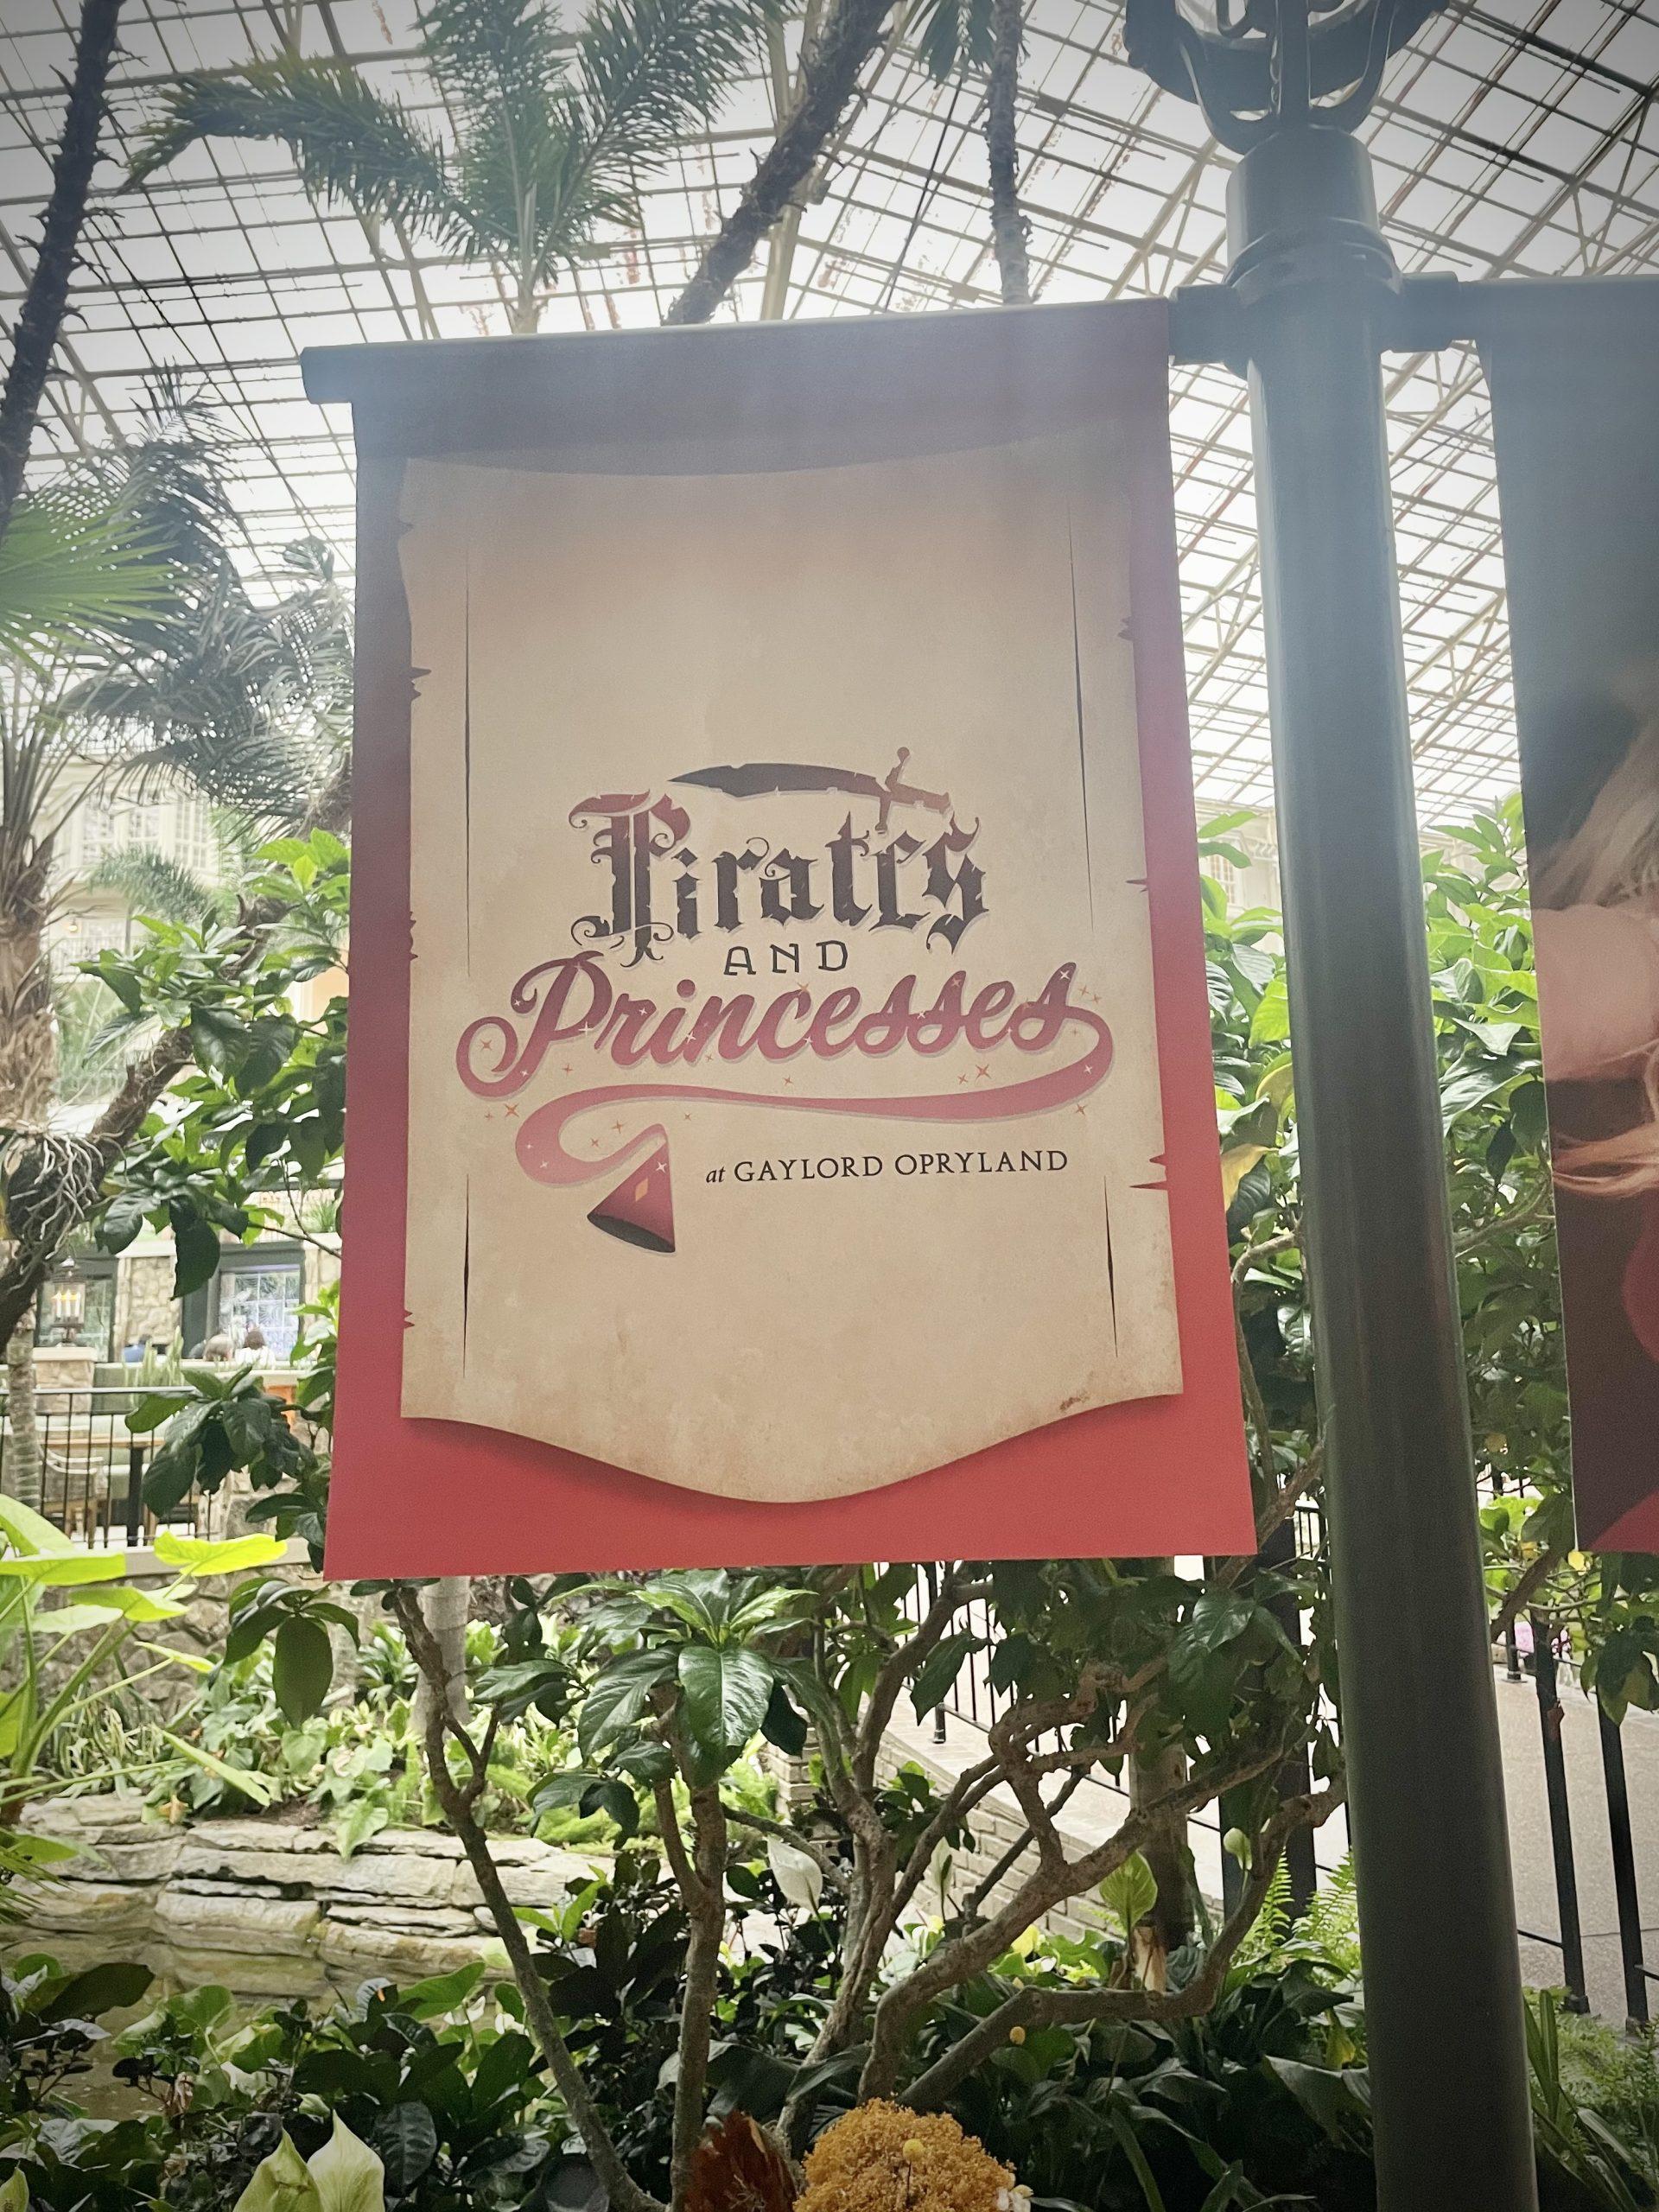 Pirate and Princesses Opryland